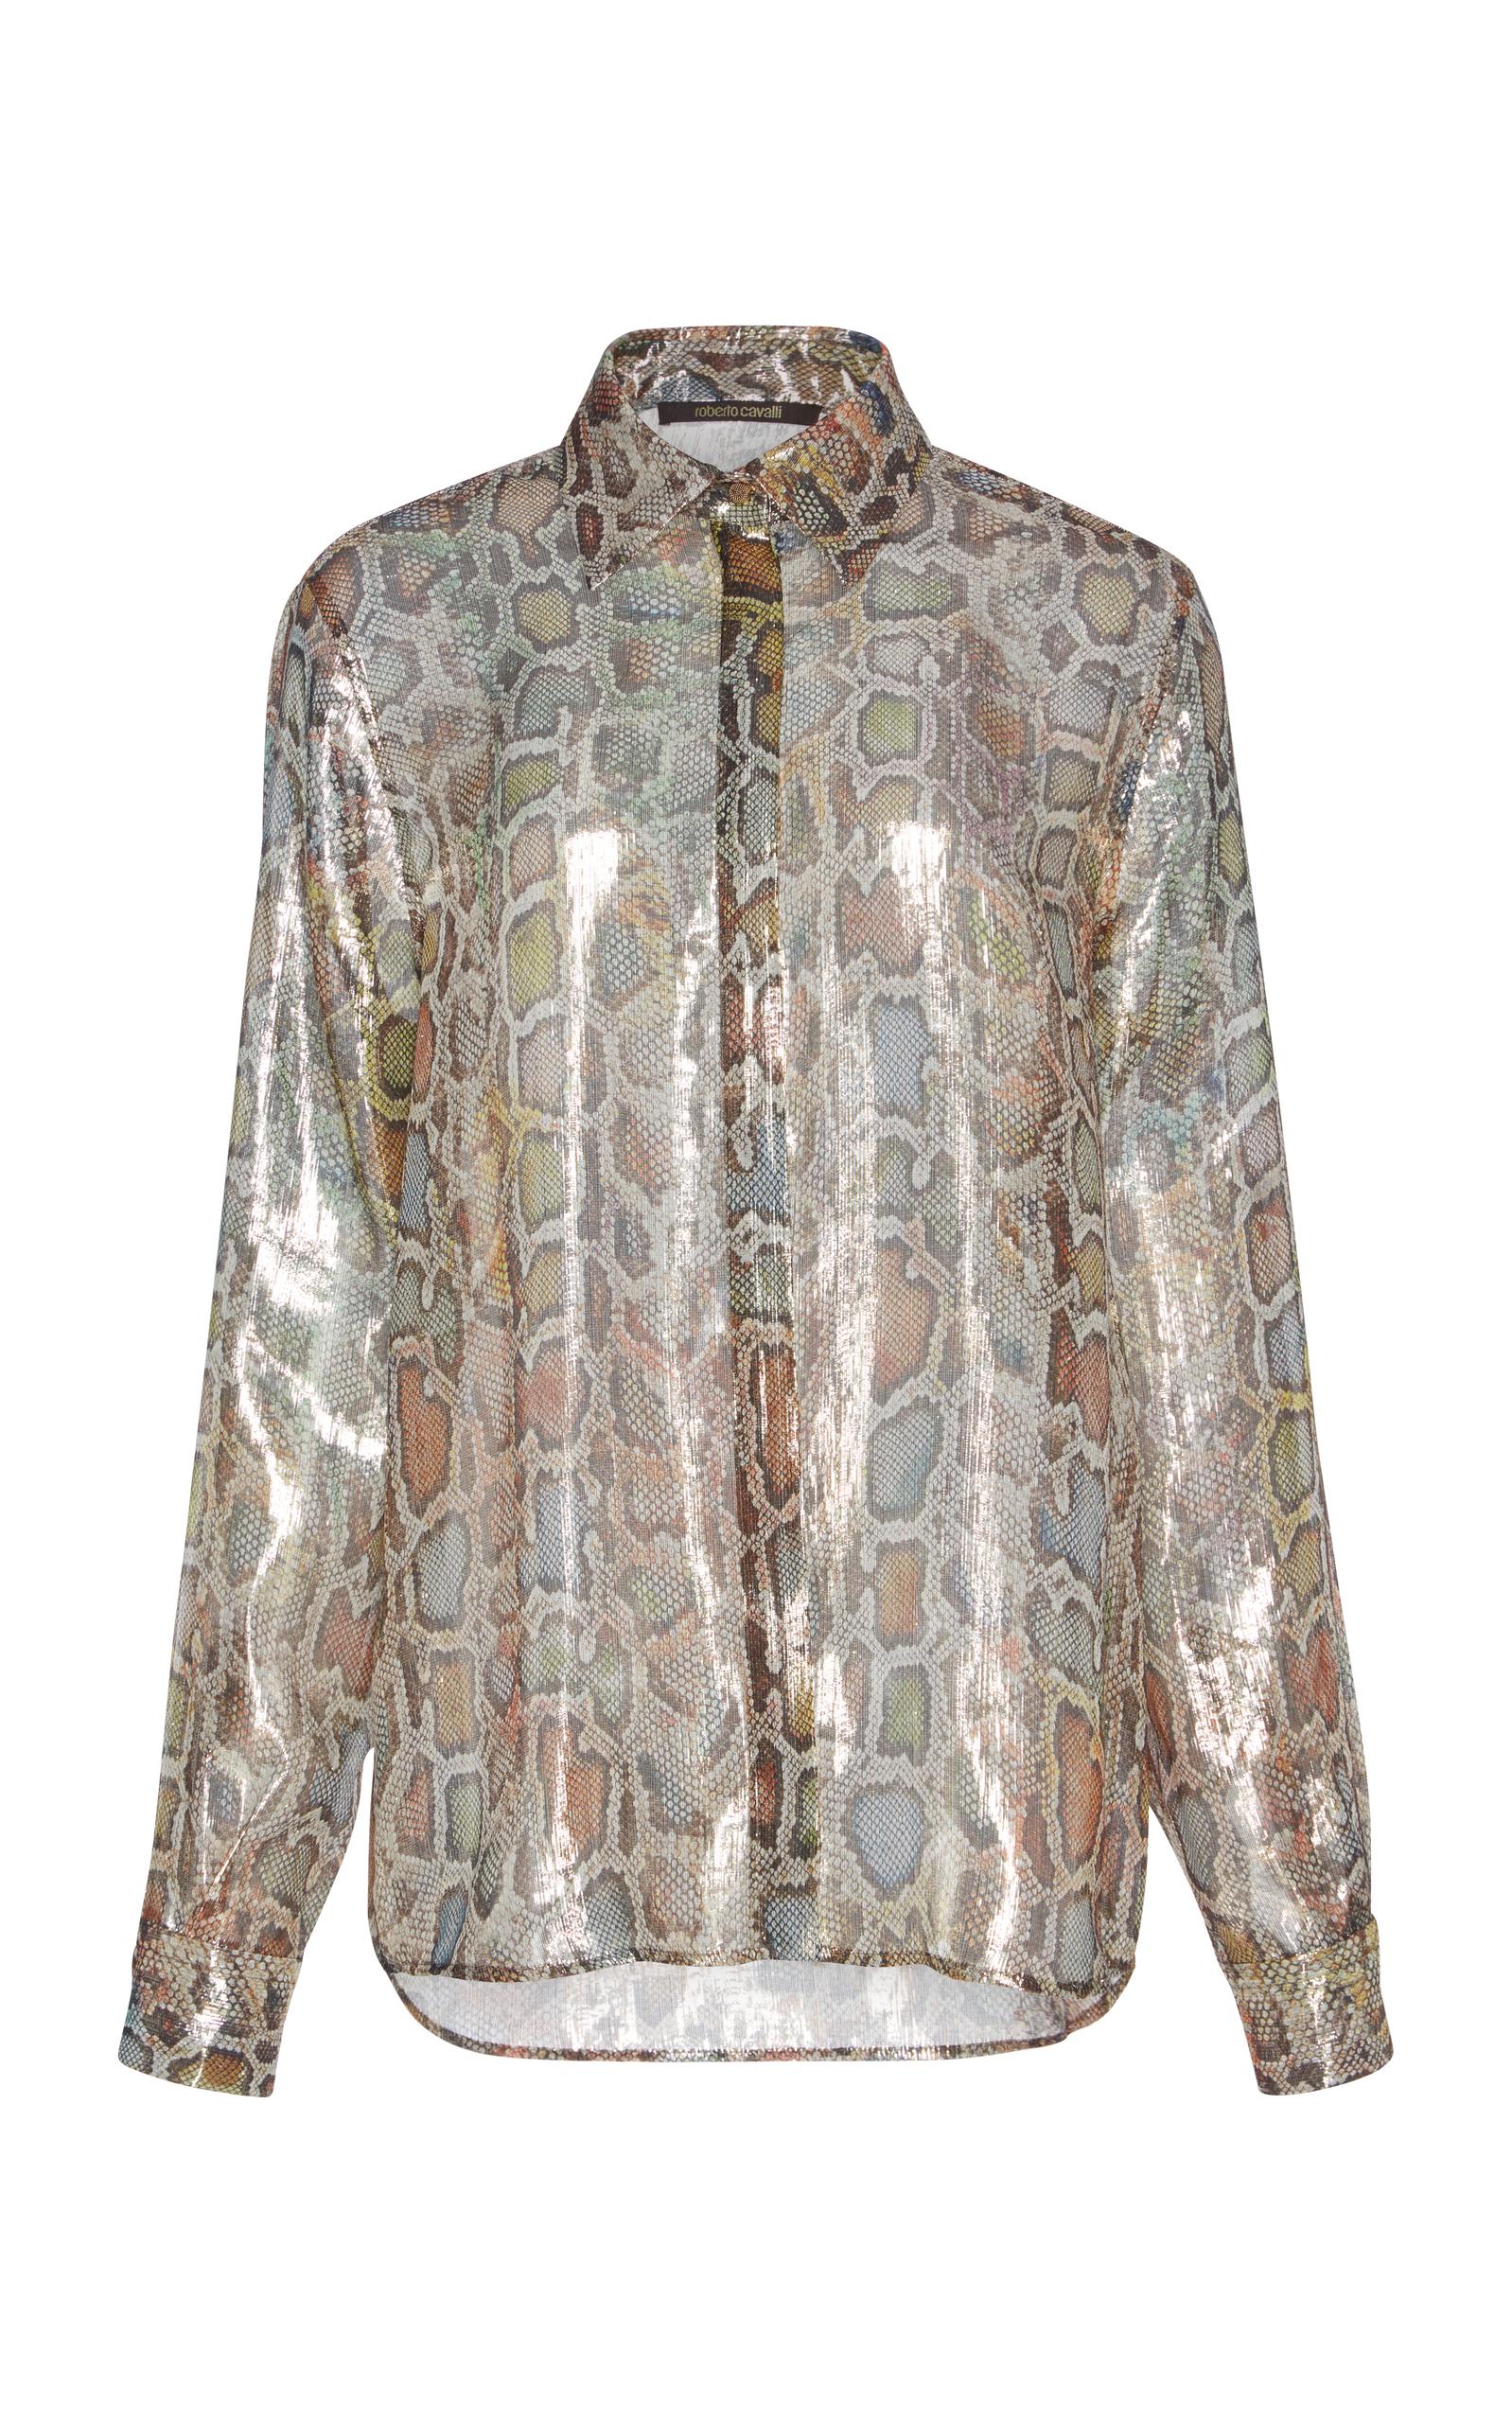 fa7a3c1af4d Roberto CavalliMetallic Silk Shirt. CLOSE. Loading